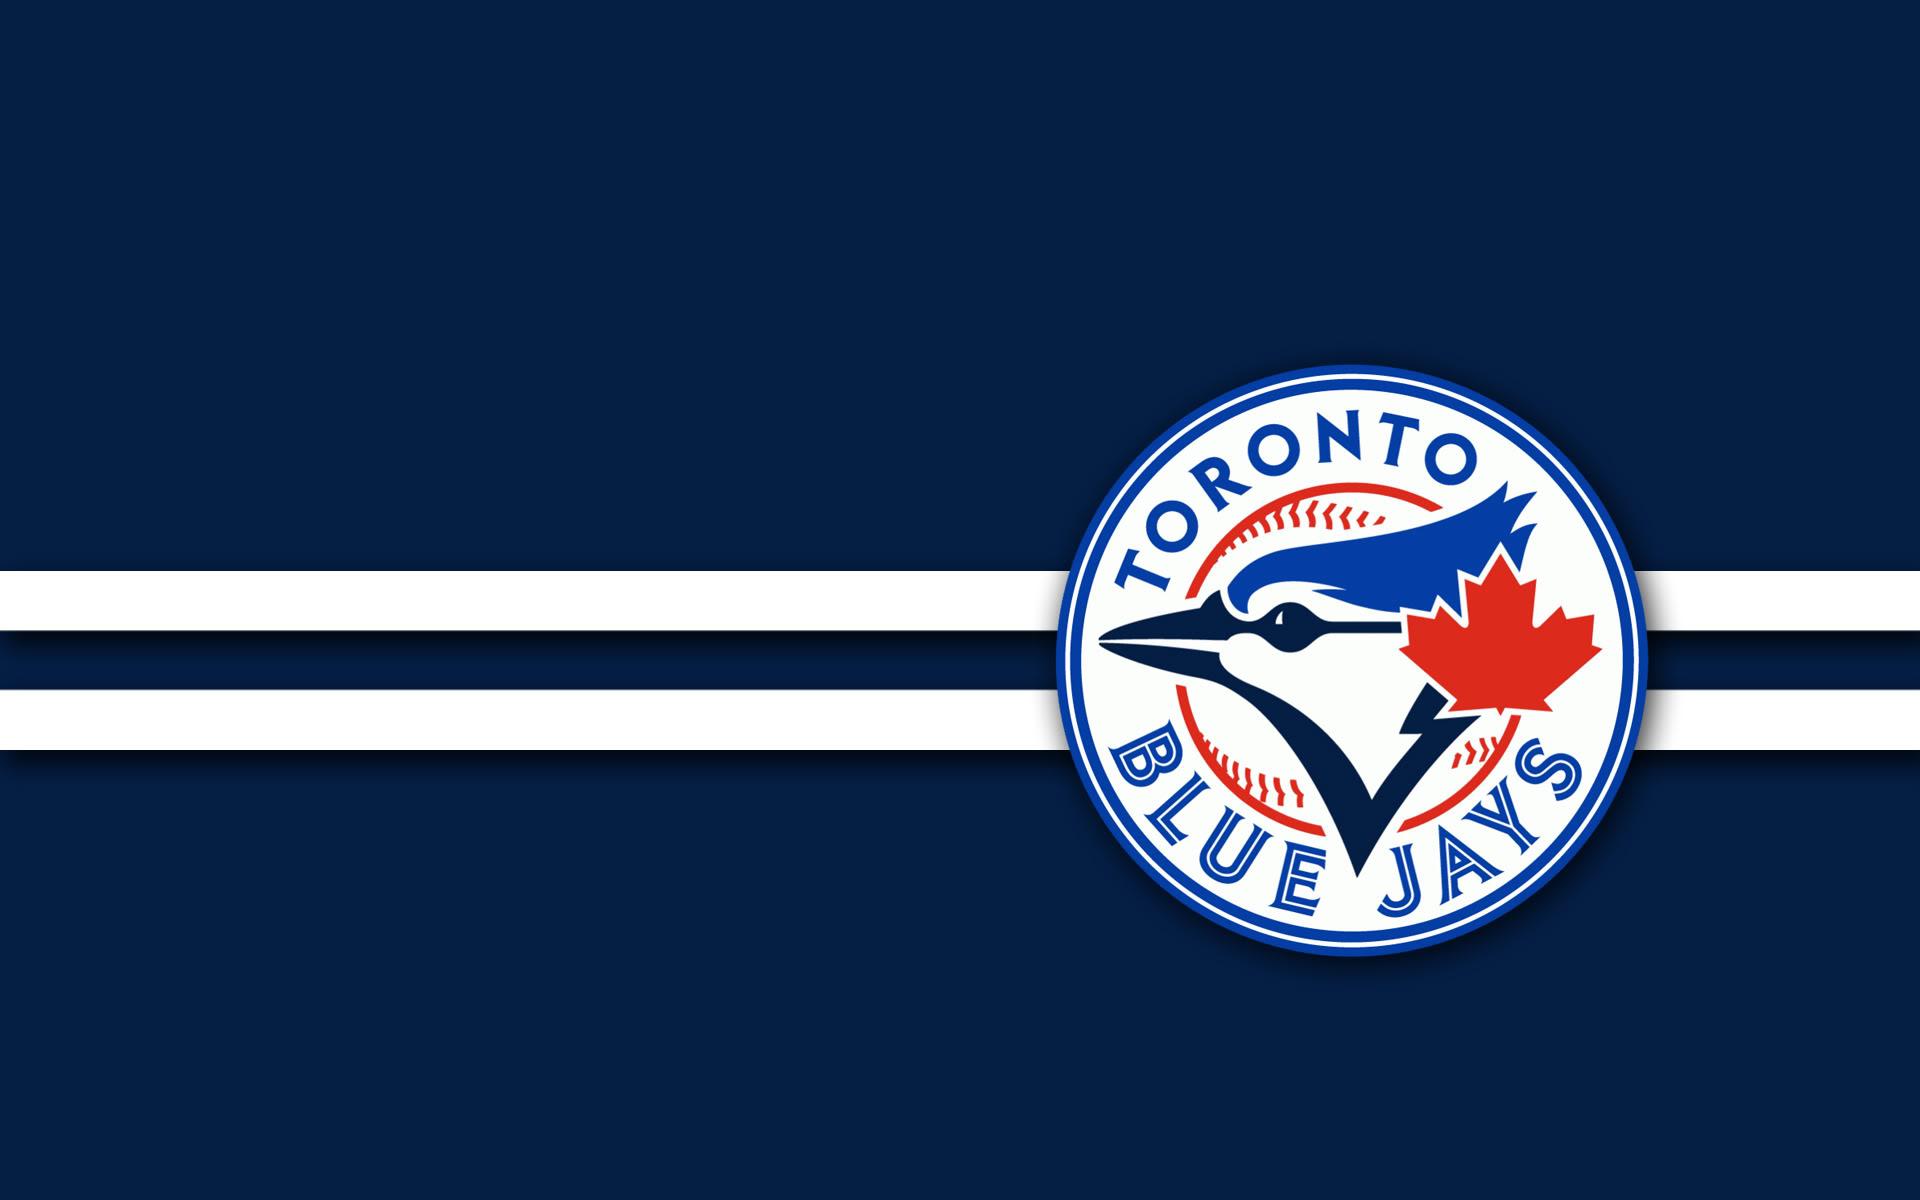 Toronto Blue Jays Wallpaper 15161 19201200 px fond ecran 1920x1200